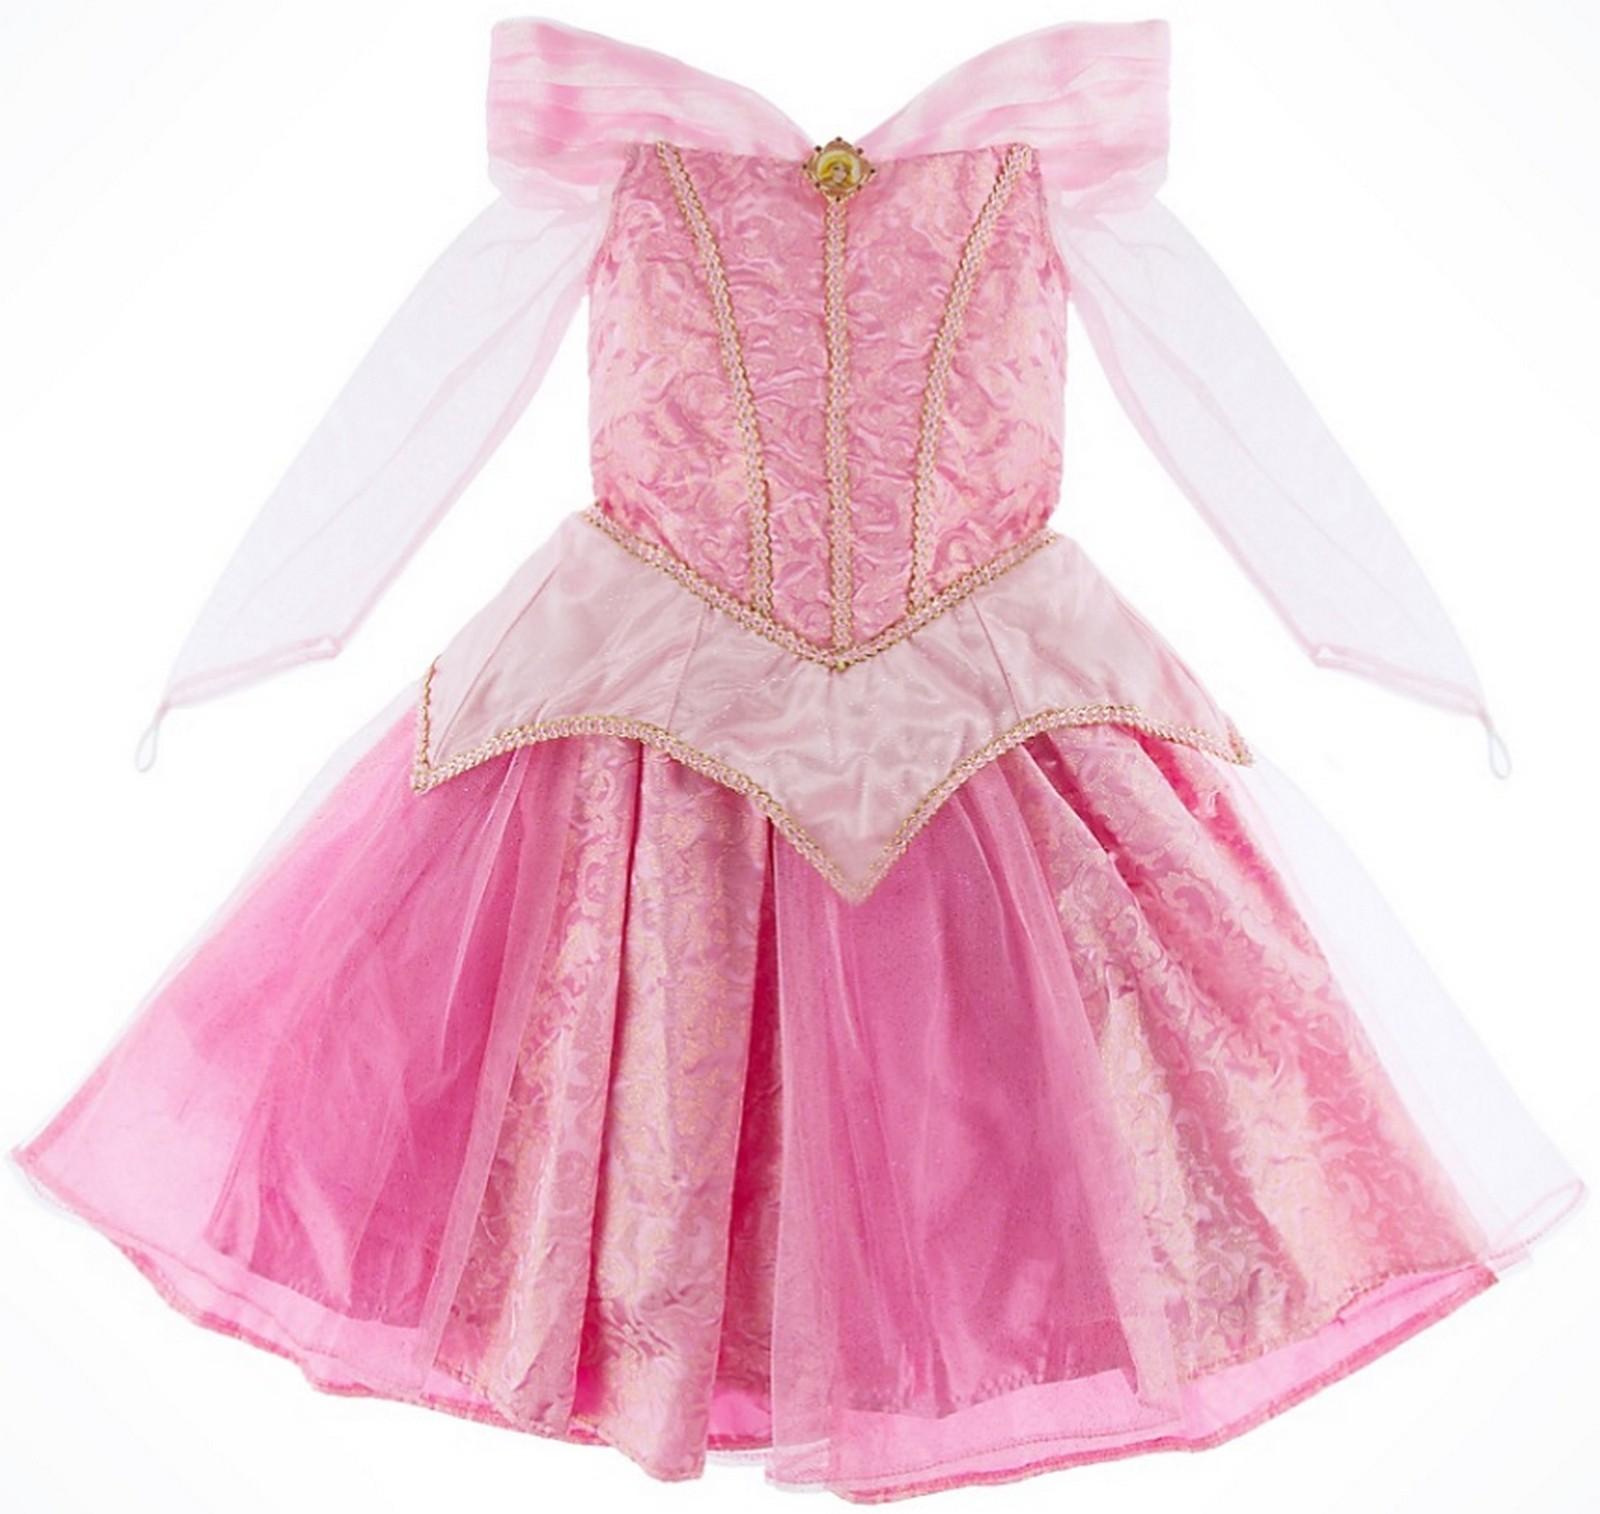 Disney Theme Park Princess Aurora (Sleeping Beauty) Dress